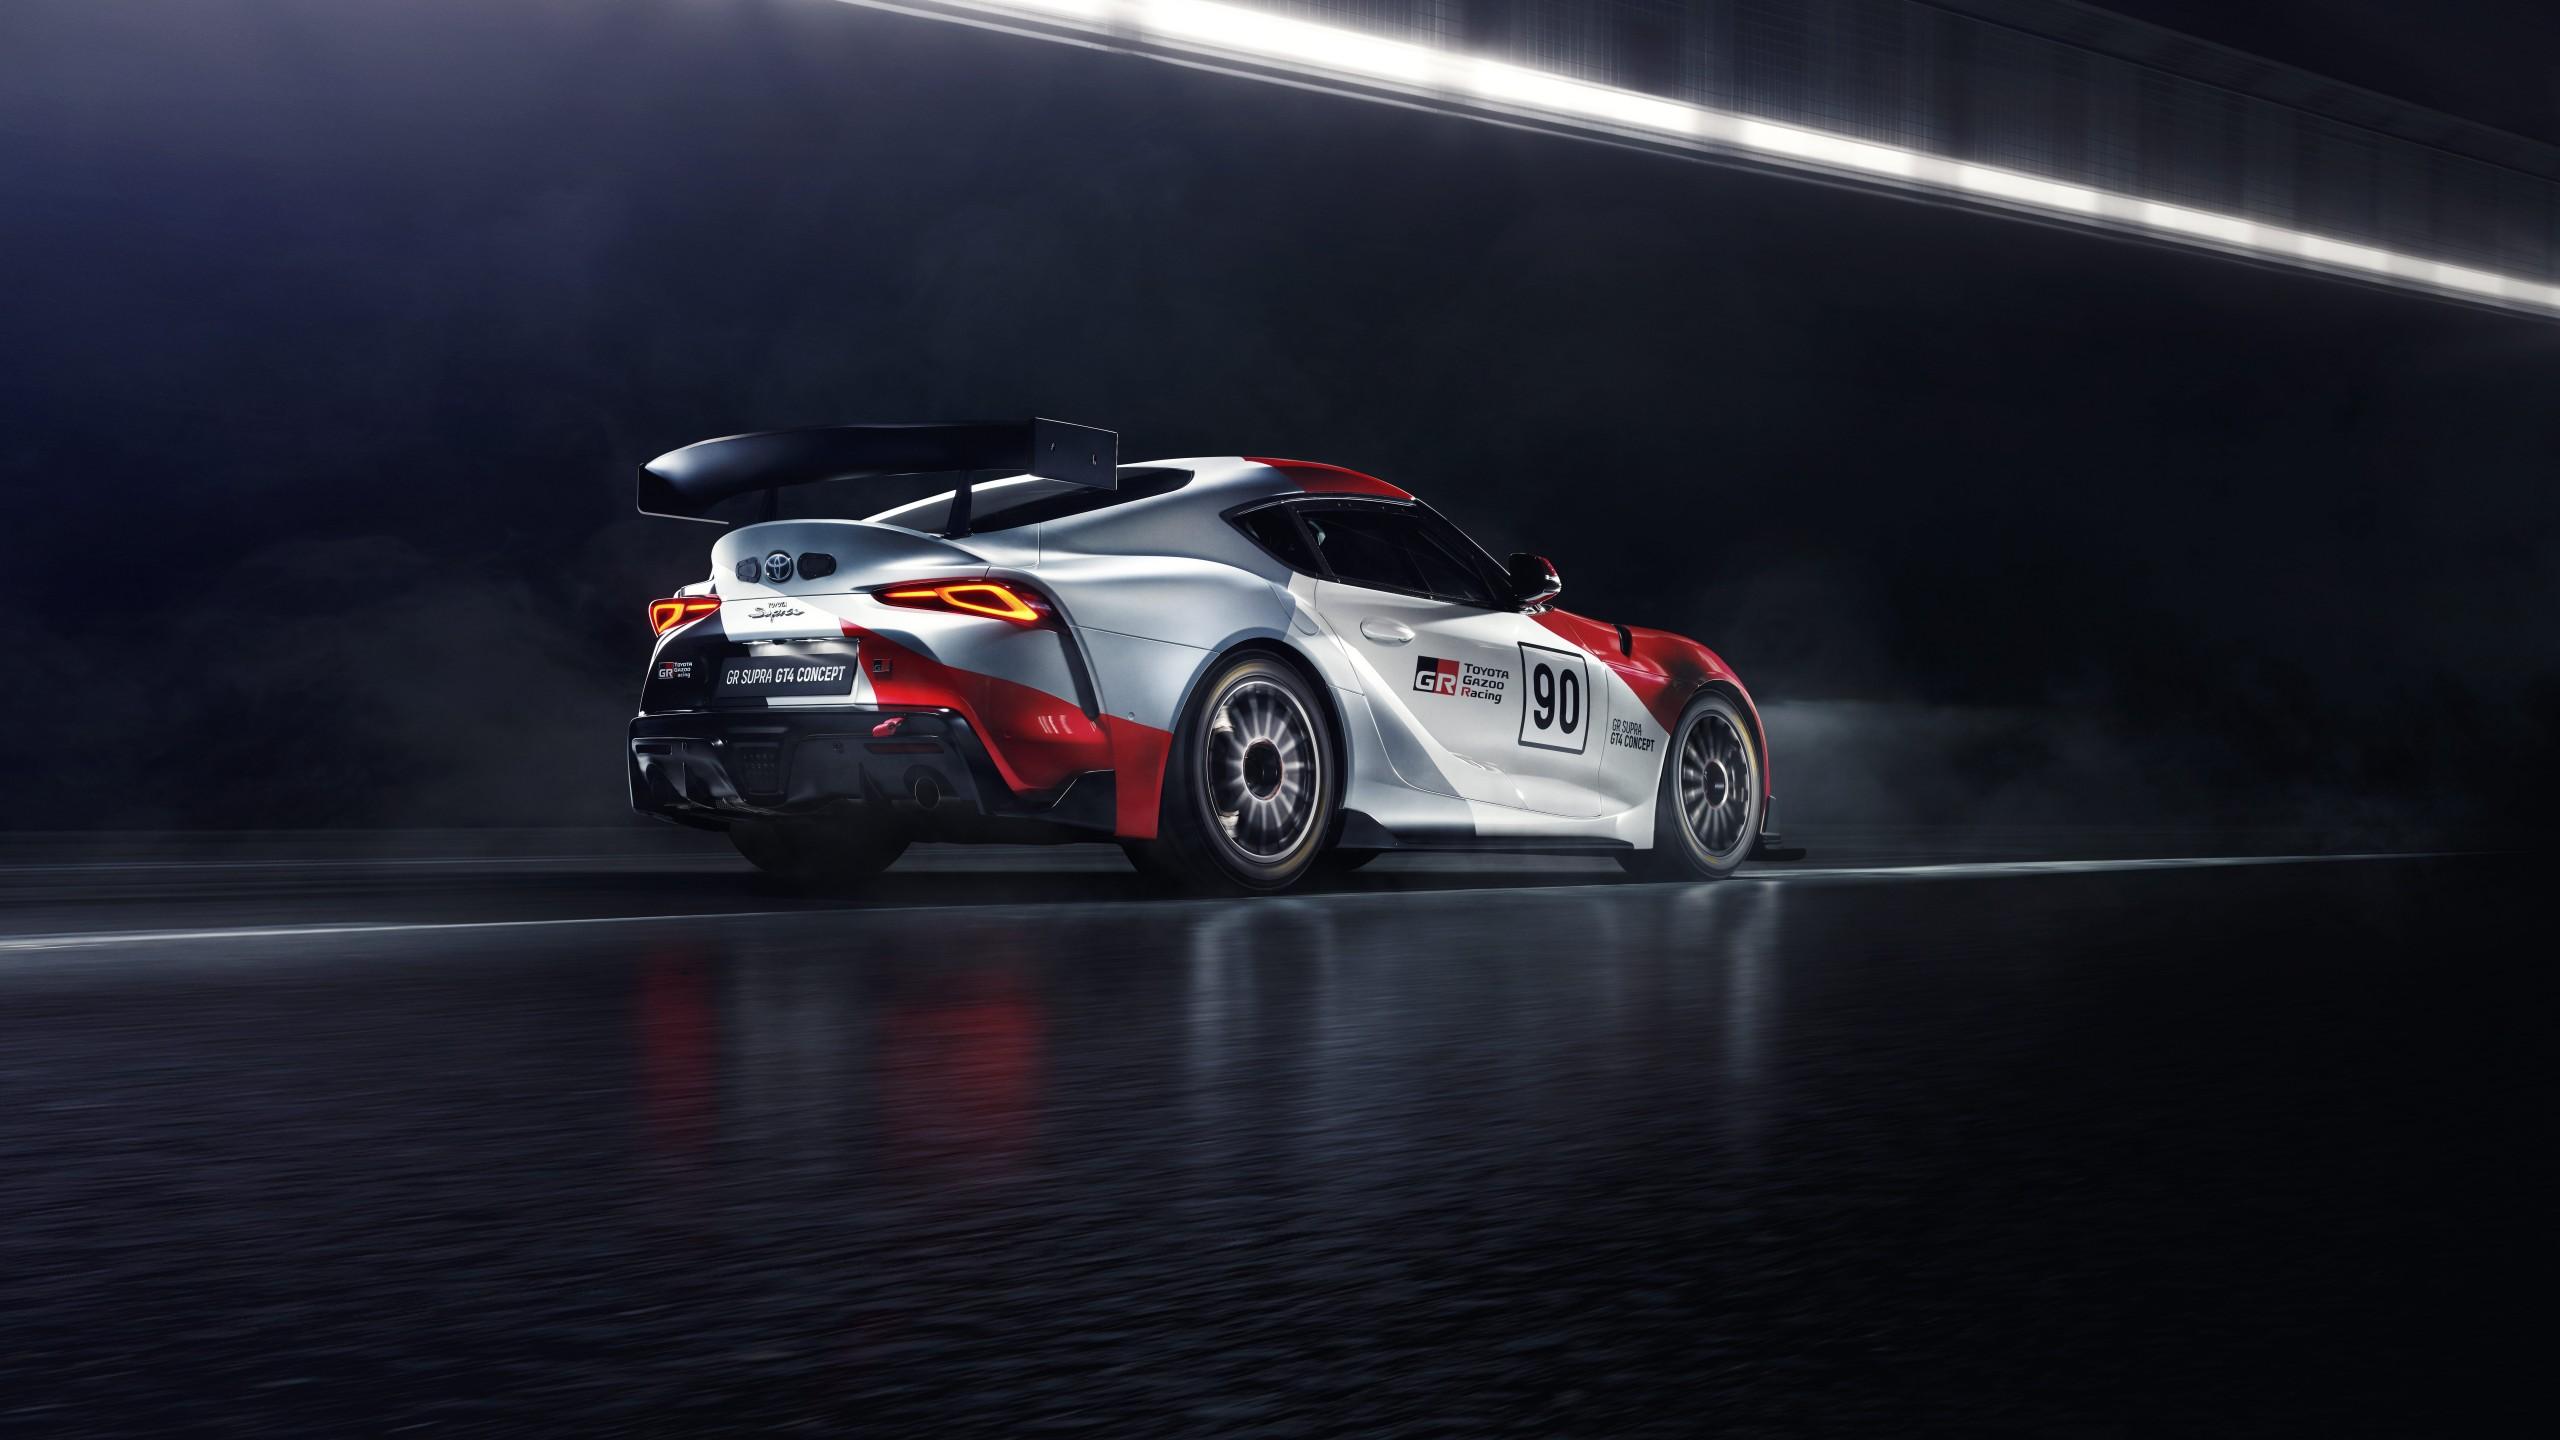 Wallpaper Toyota GR Supra GT4 2019 Cars Geneva Motor Show 2019 2560x1440